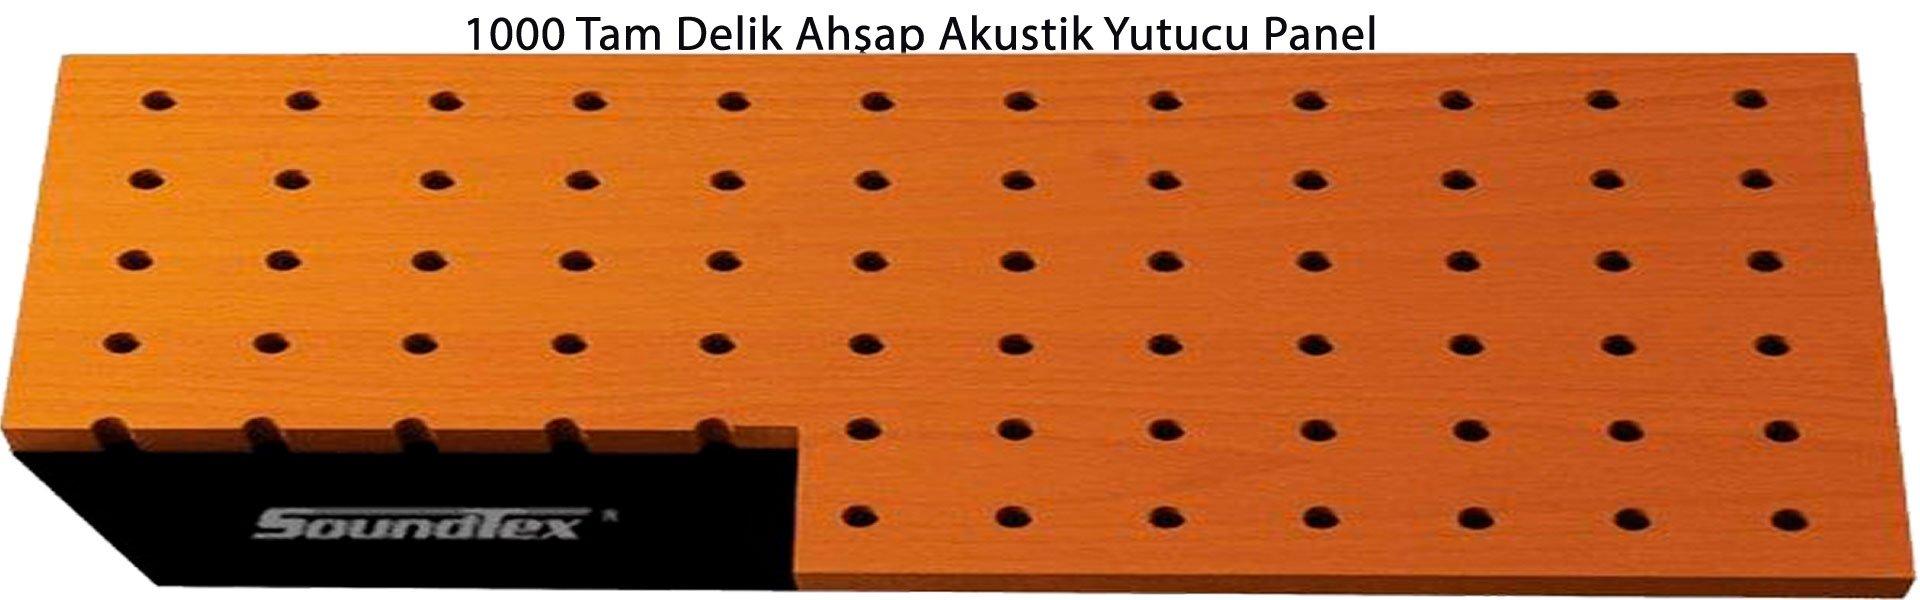 1000 Tam Delik Ahşap Akustik Yutucu Panel